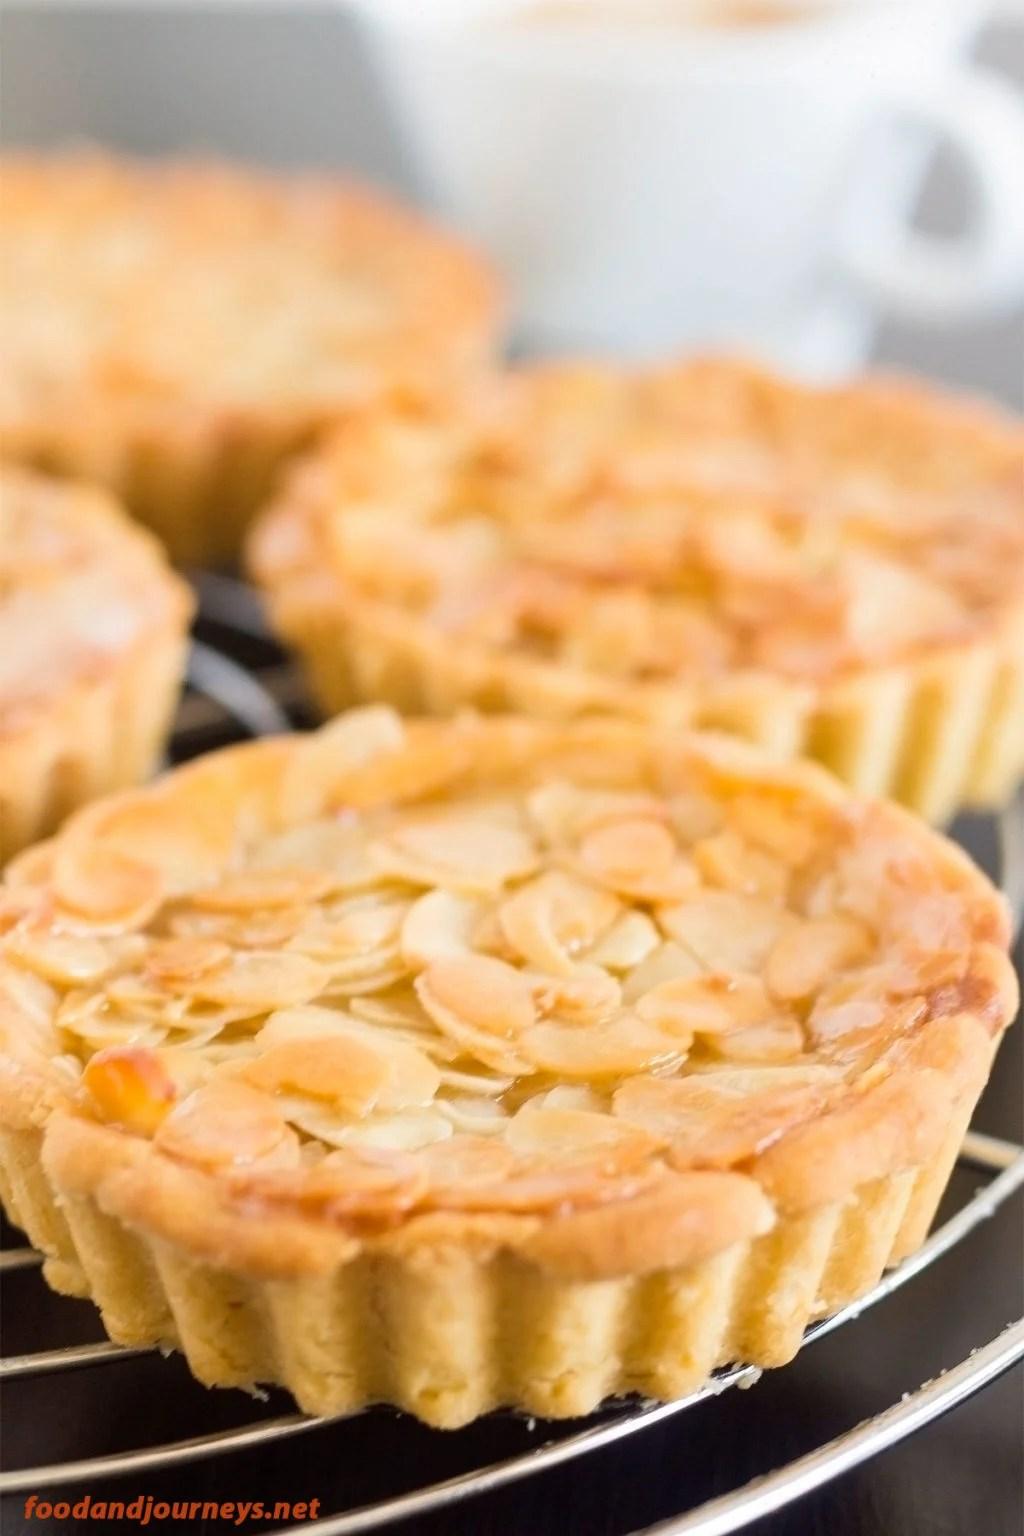 Closer shot of Swedish Almond Tart, highlighting the almond bits on top.